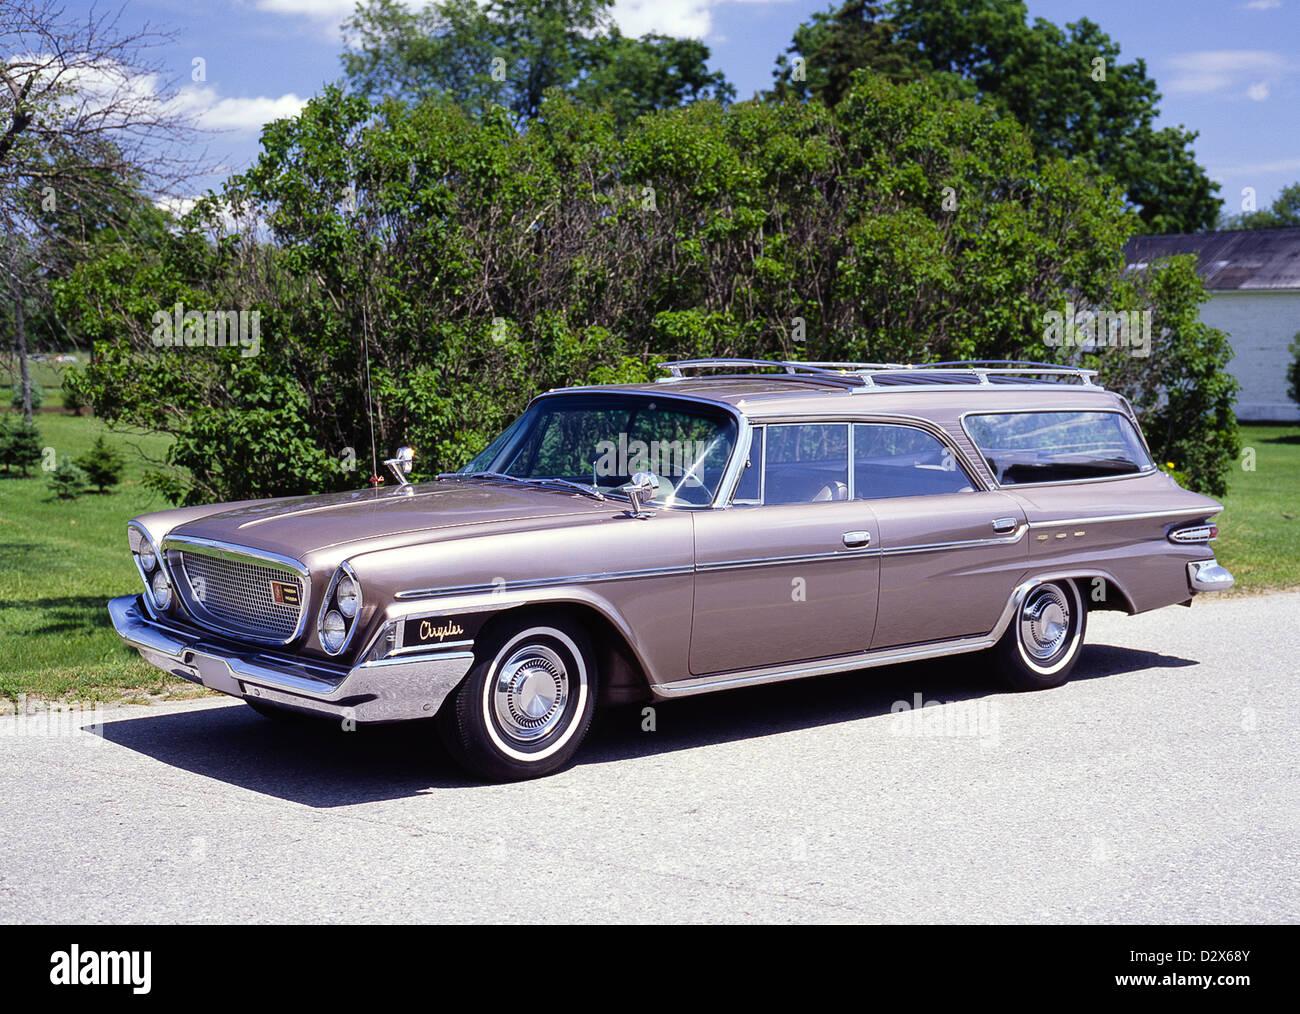 1962 chrysler newport station wagon stock photo royalty. Black Bedroom Furniture Sets. Home Design Ideas